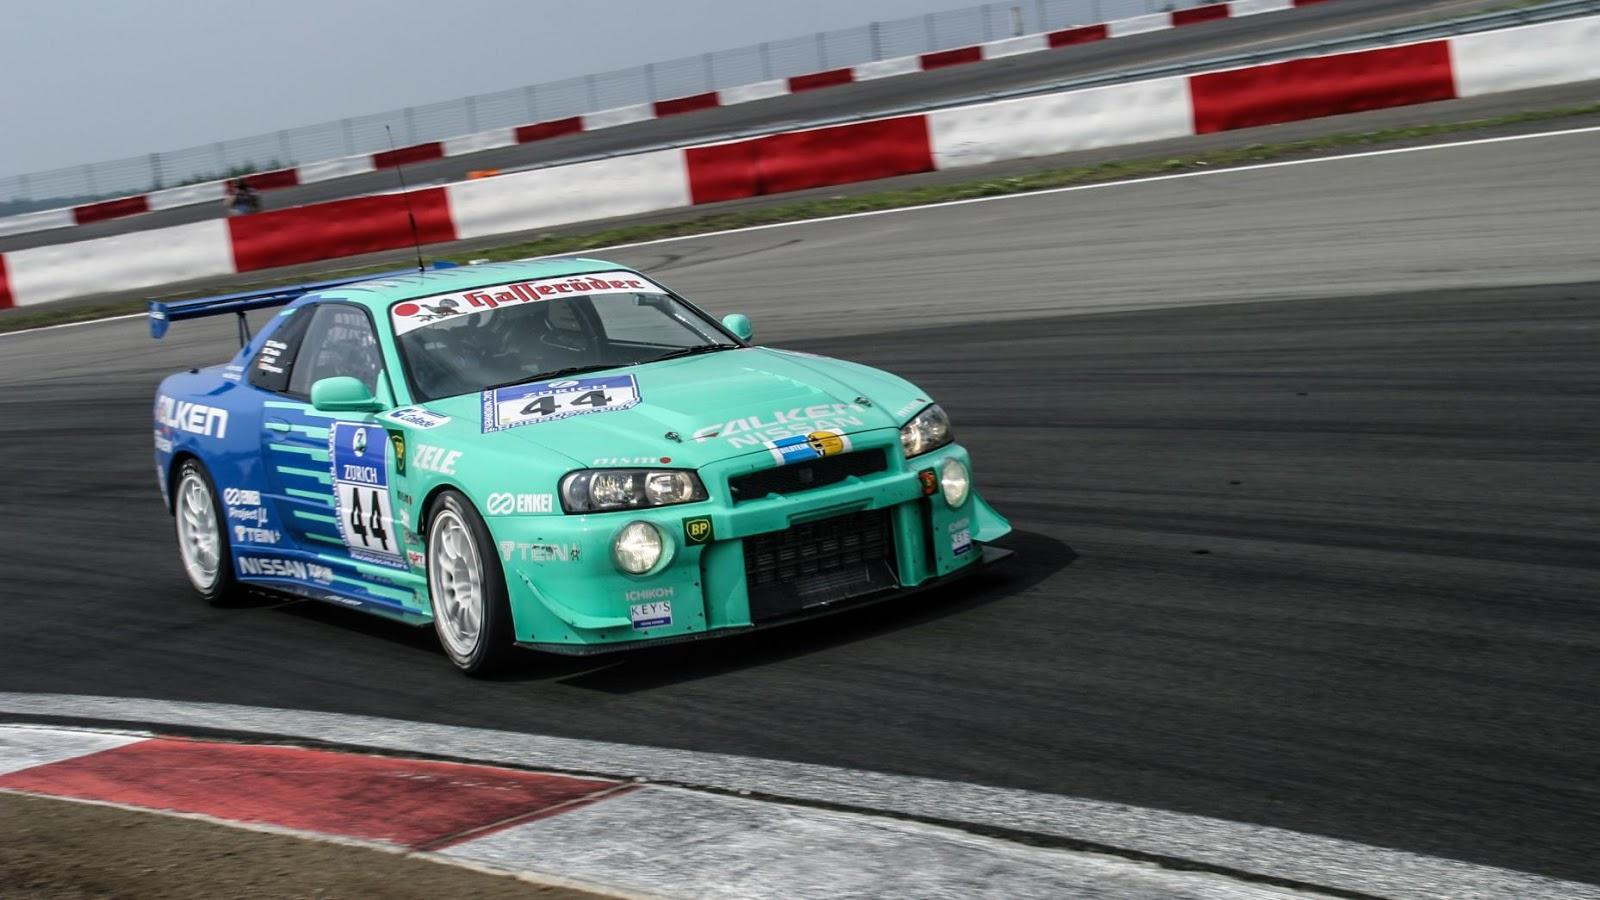 2001 - Nissan Skyline GT-R R34